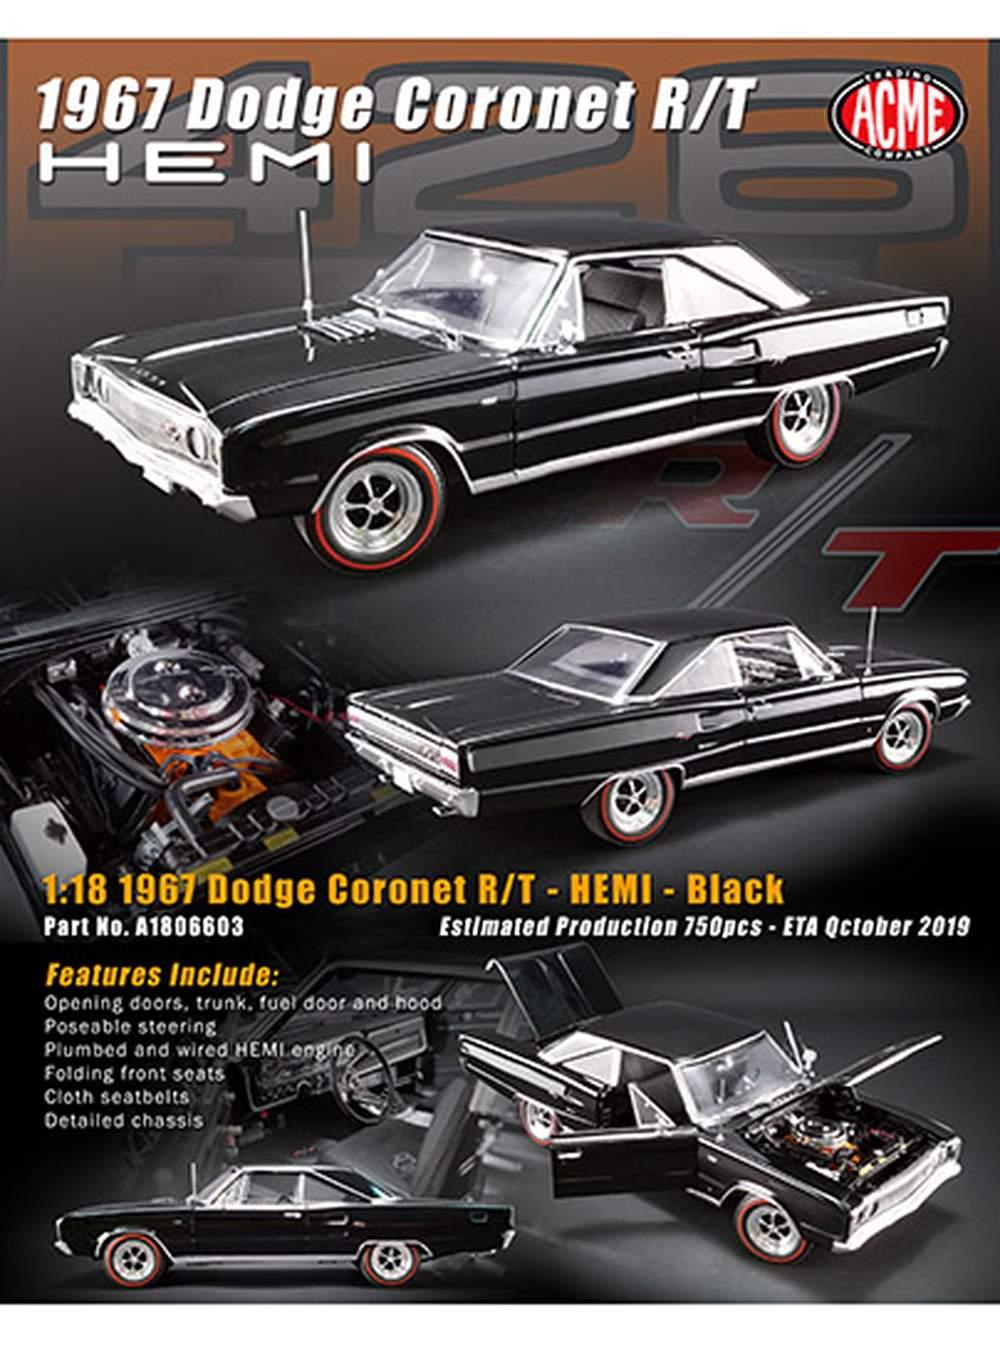 1:18 1967 Dodge Coronet R/T (Black on Black)